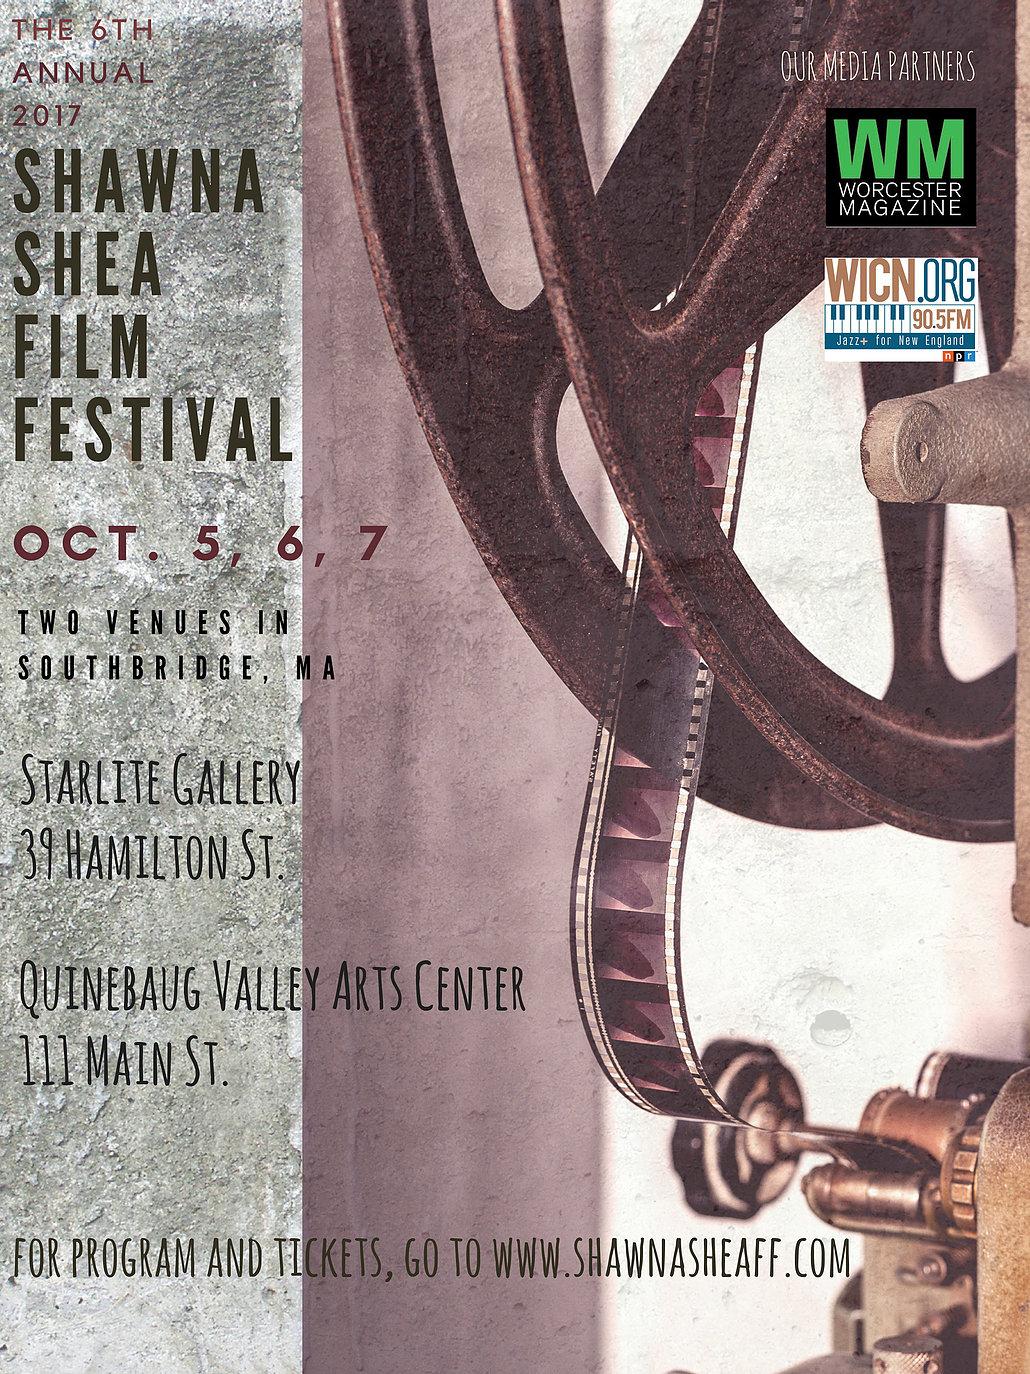 Shawna Shea Memorial Film Festival 2017